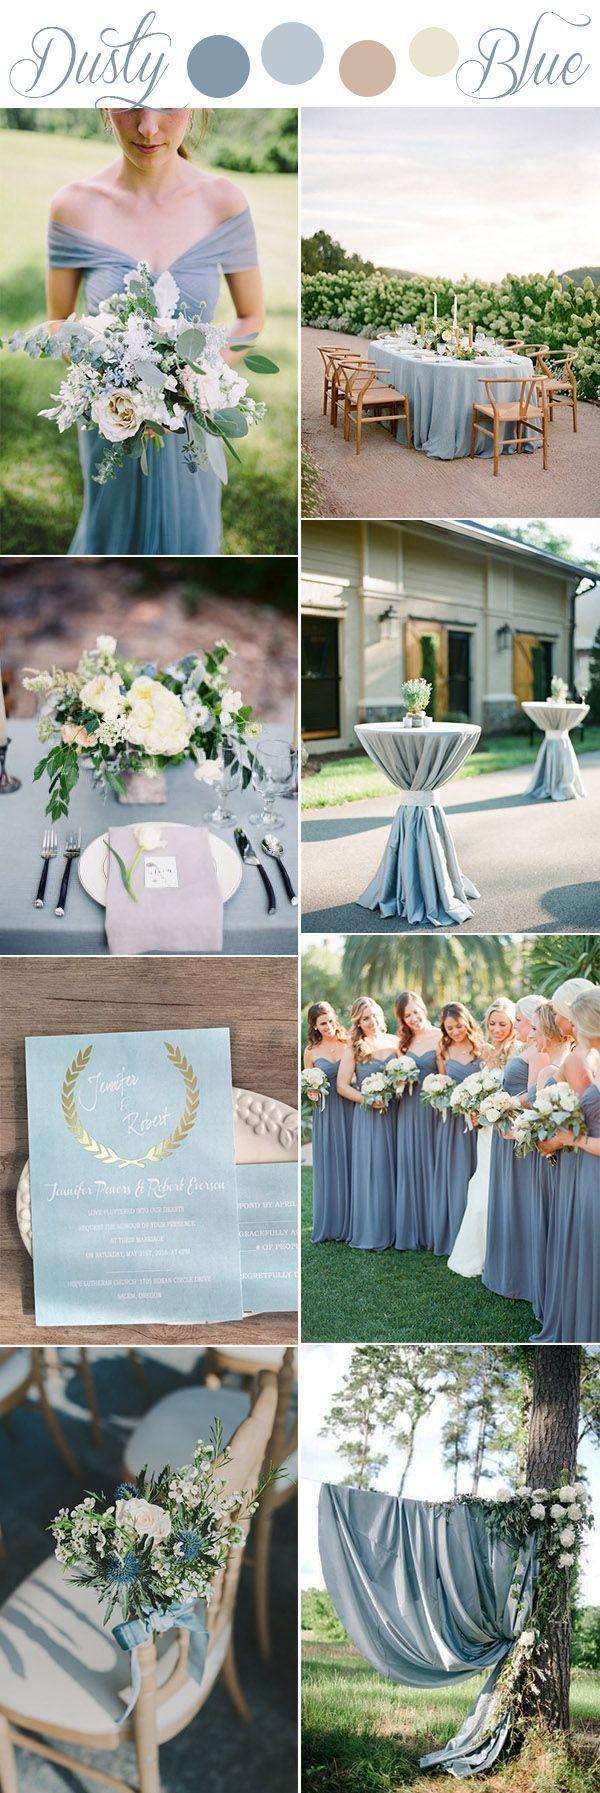 Wedding decorations dusty blue december 2018 romantic softest dusty blue rustic wedding color ideas  Weddings